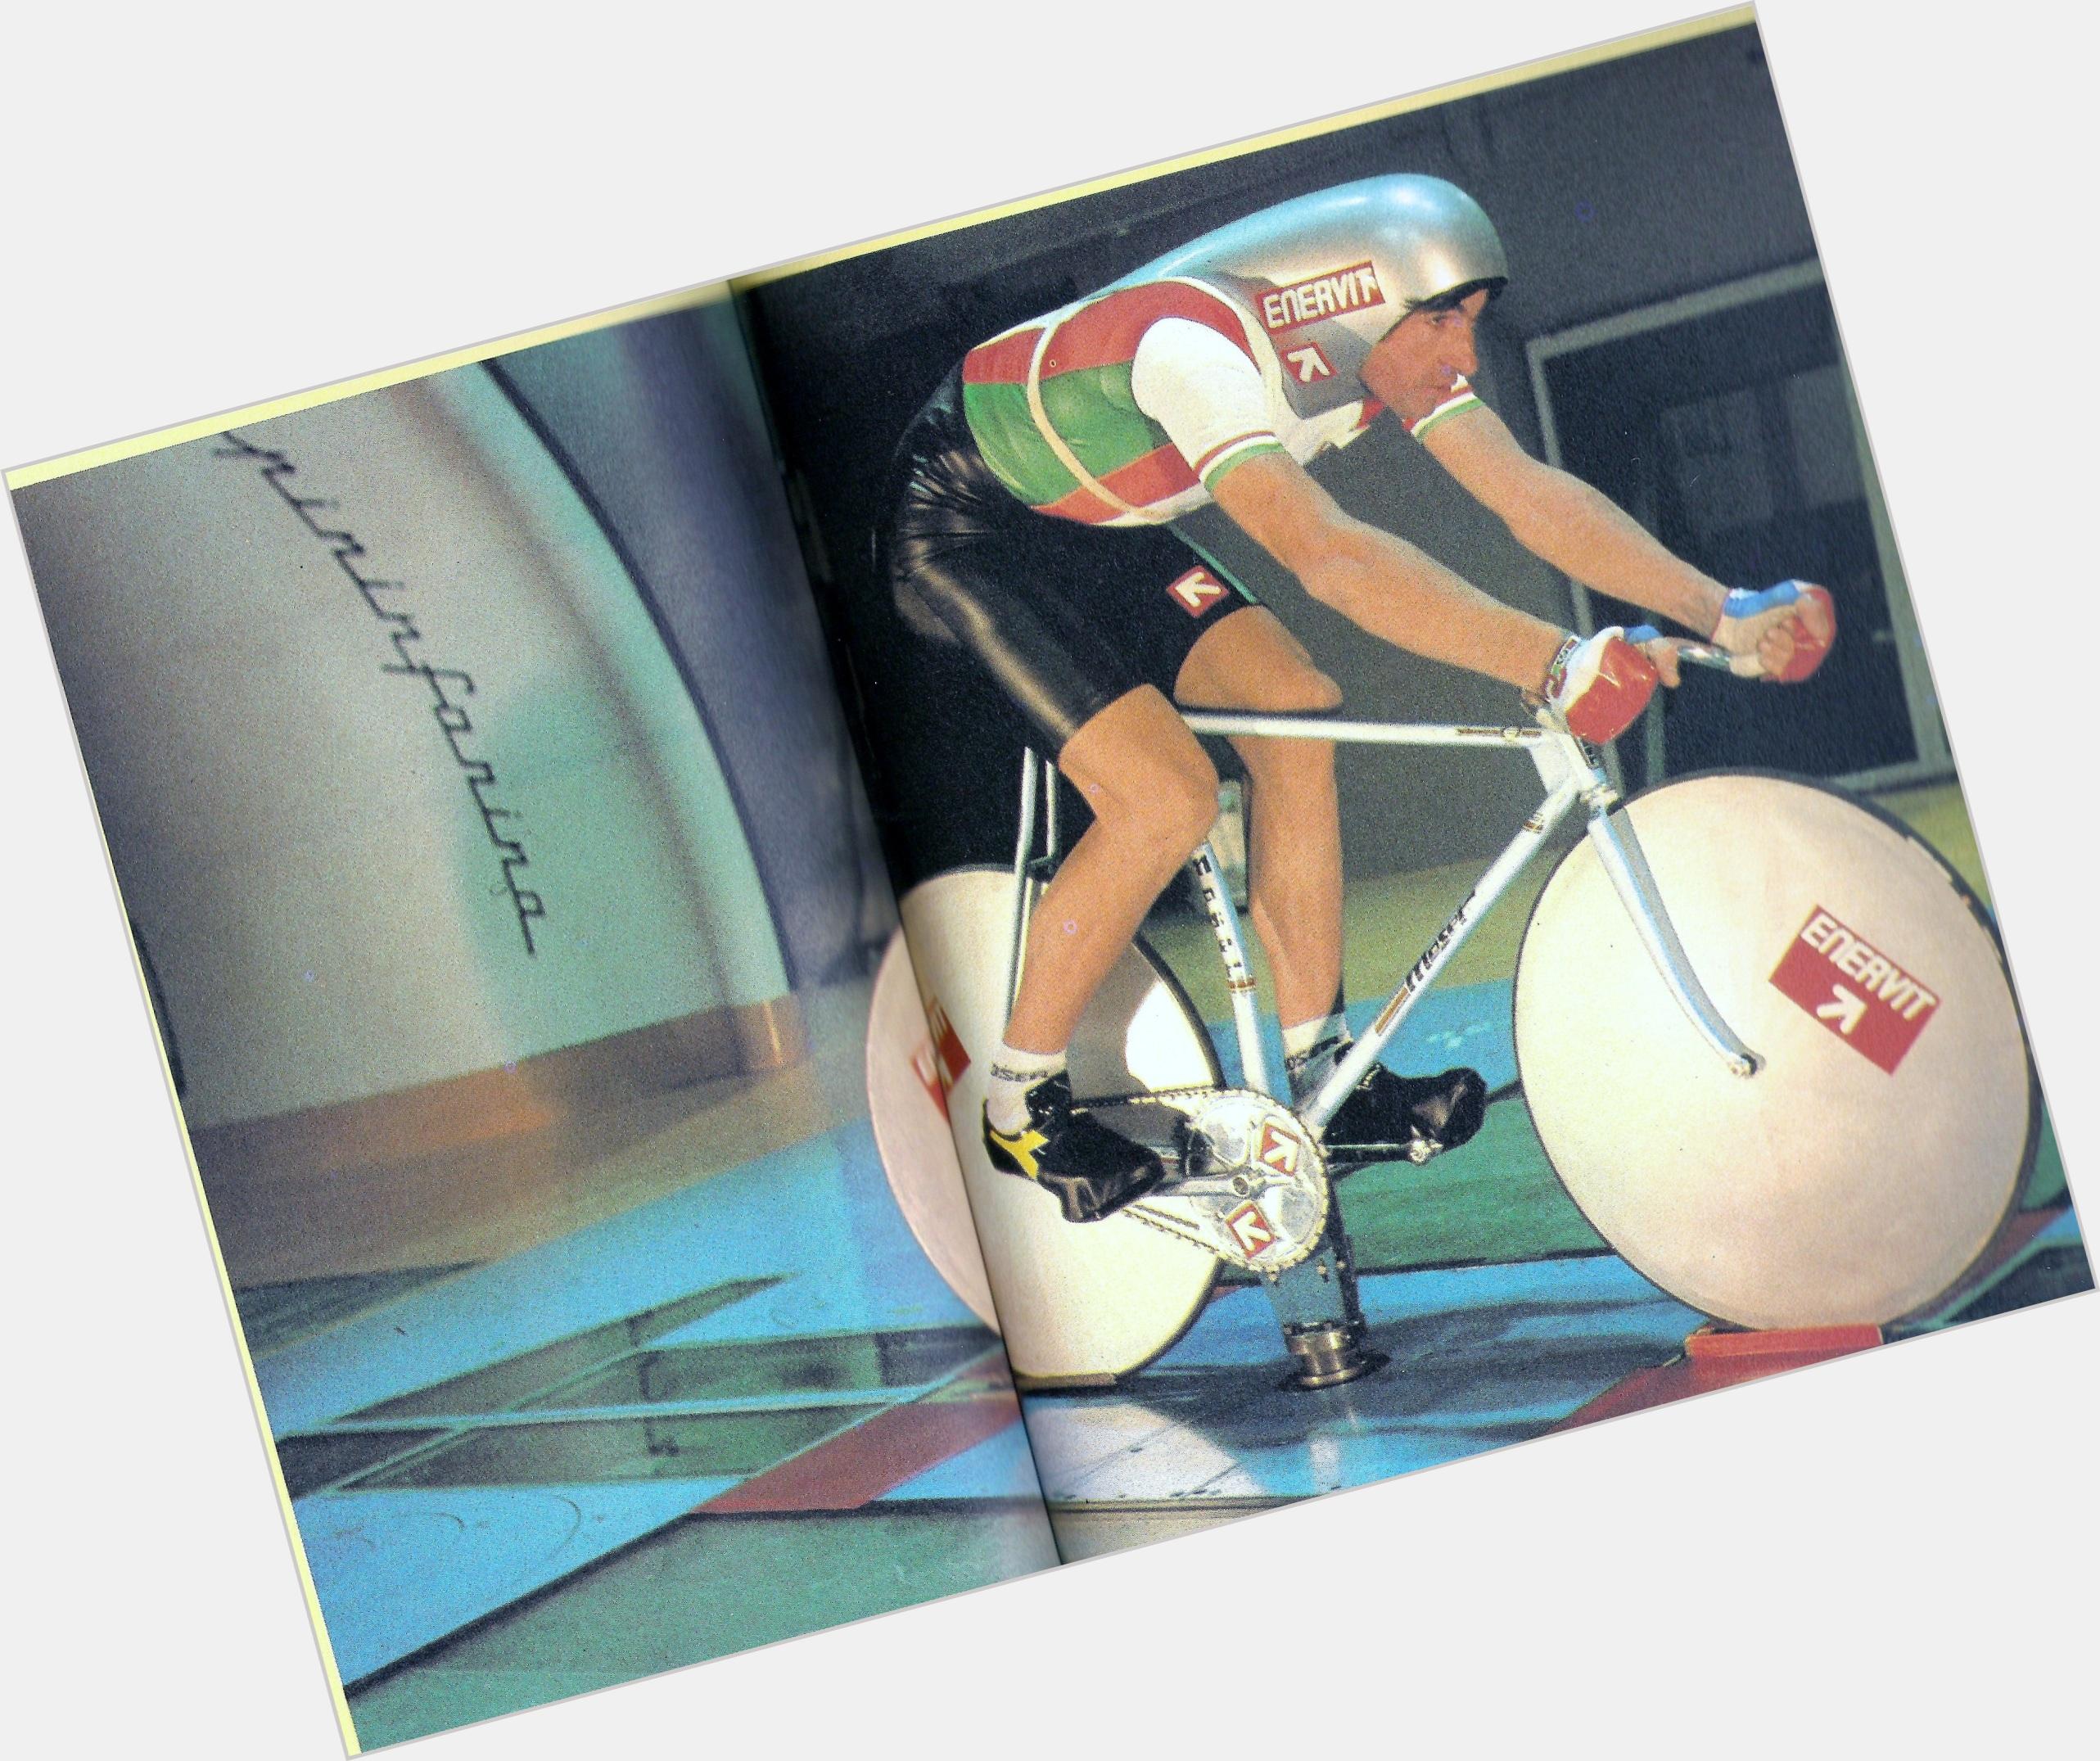 Francesco Moser sexy 4.jpg